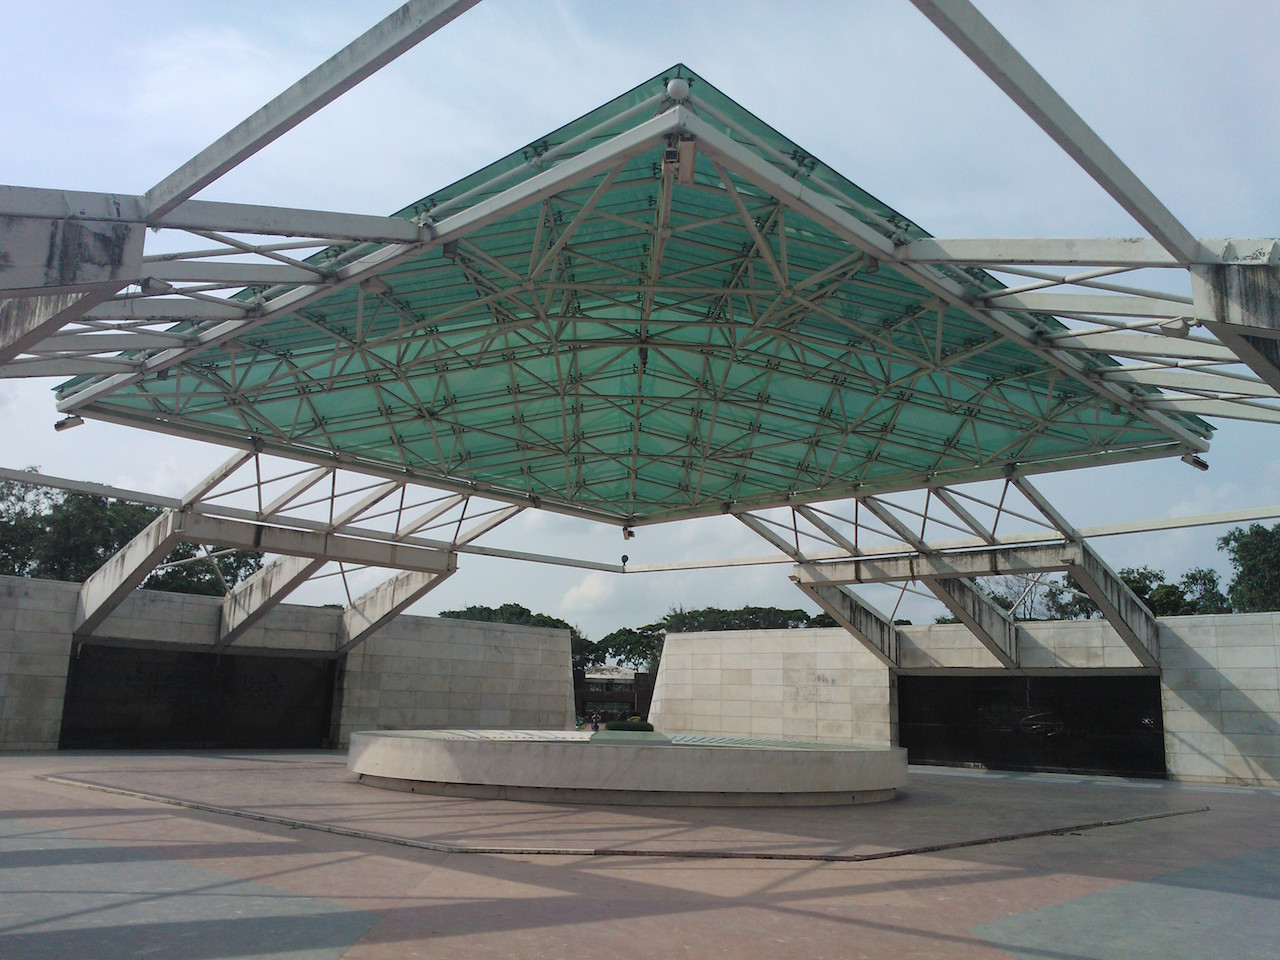 The Ziaur Rahman mausoleum alongside Bangladesh's parliament building (photo by Nahid Sultan, via Wikimedia Commons)